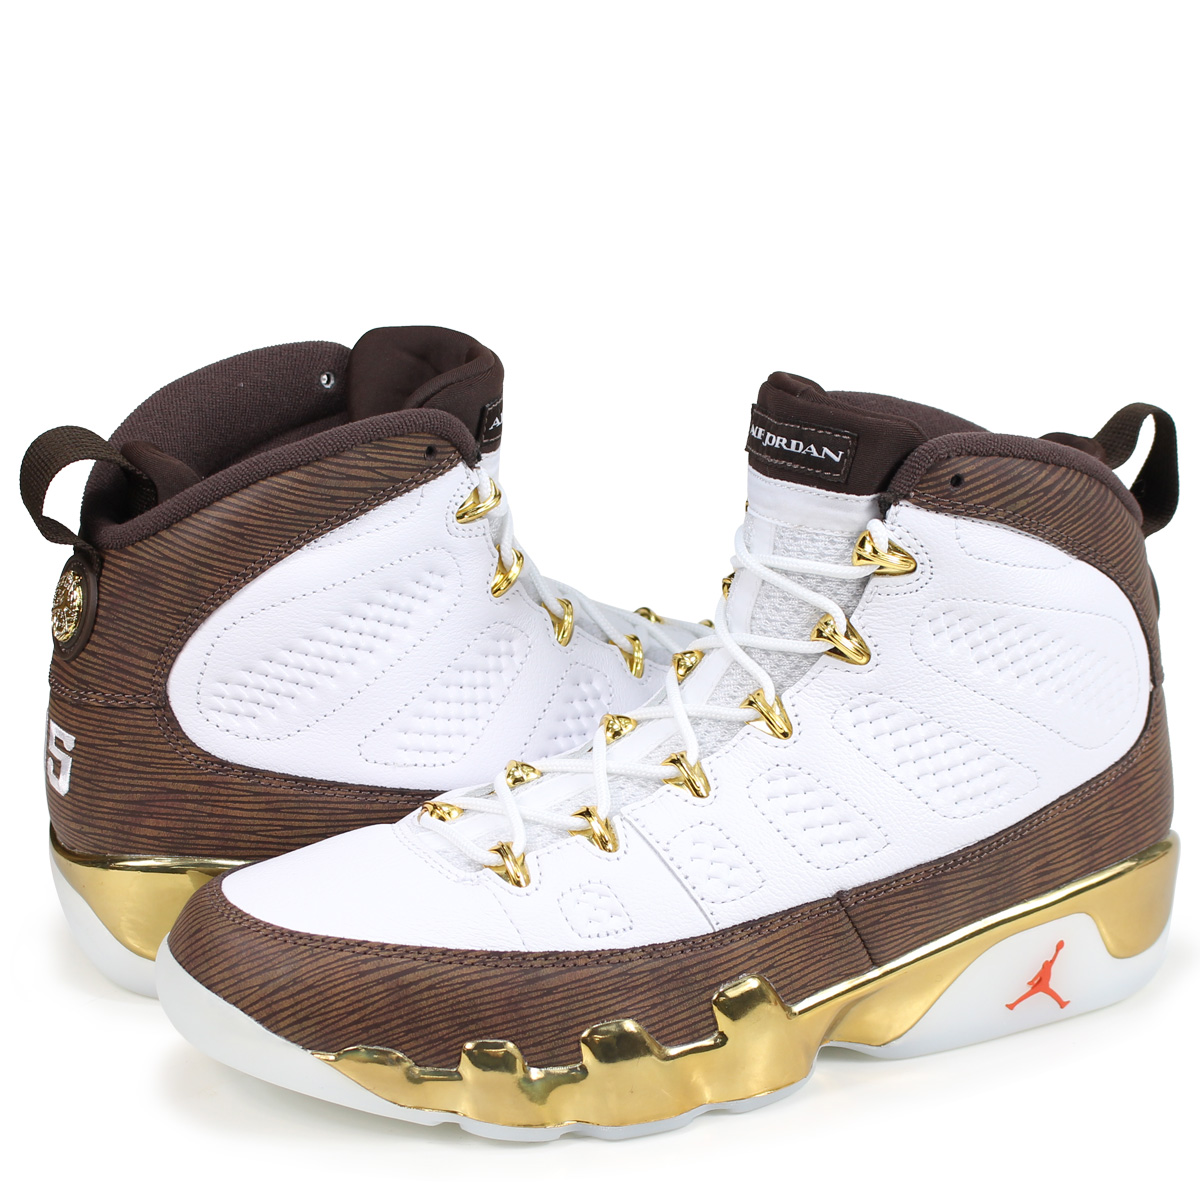 cecefe0c61d ALLSPORTS: NIKE AIR JORDAN 9 RETRO MOP MELO Nike Air Jordan 9 nostalgic  sneakers men 302,370-122 white [189] | Rakuten Global Market